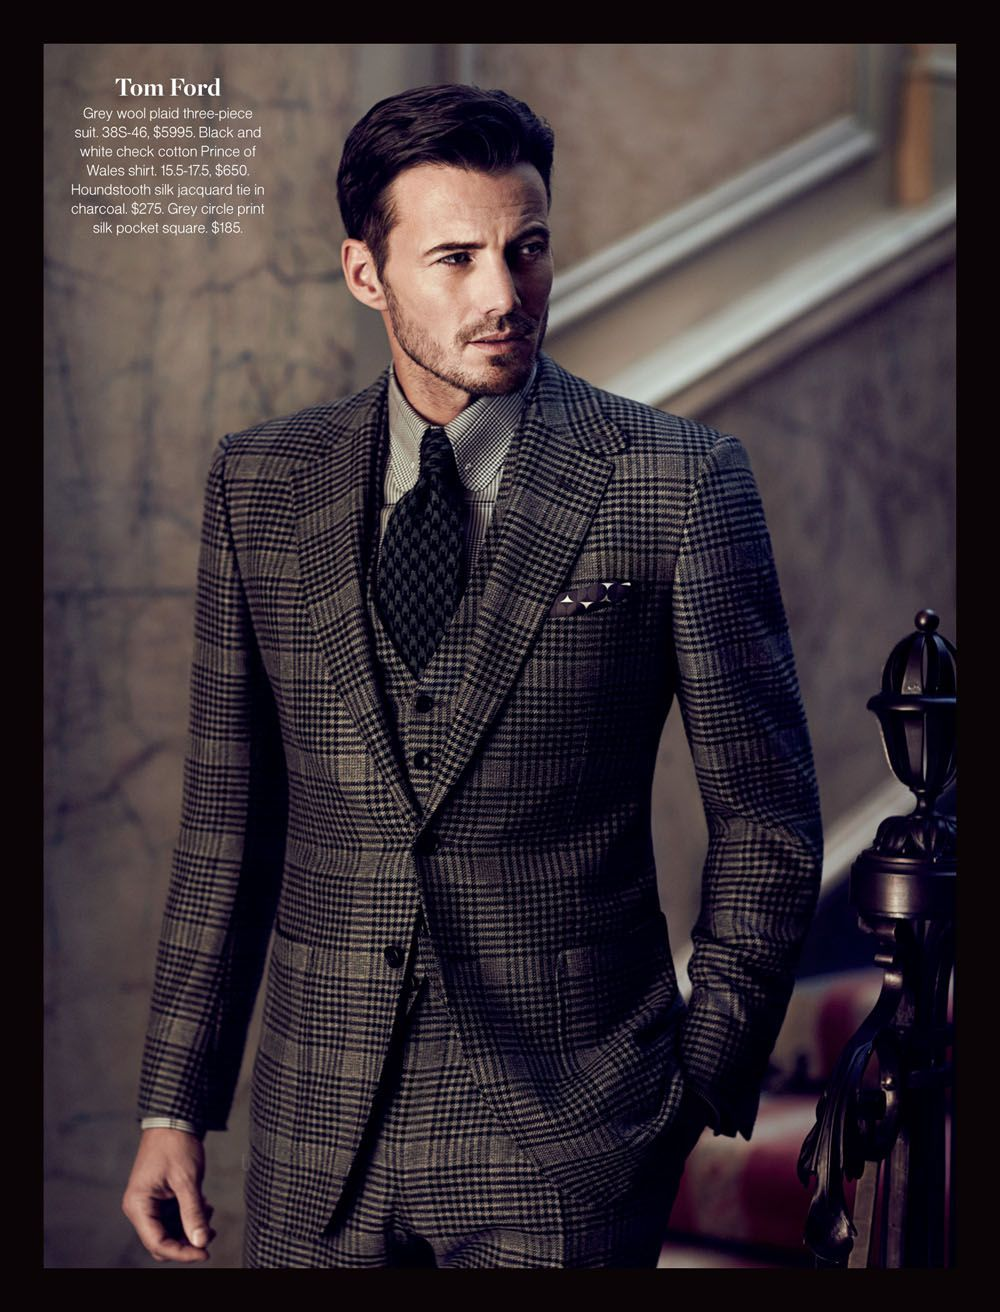 Tom Ford Black Suit Tie